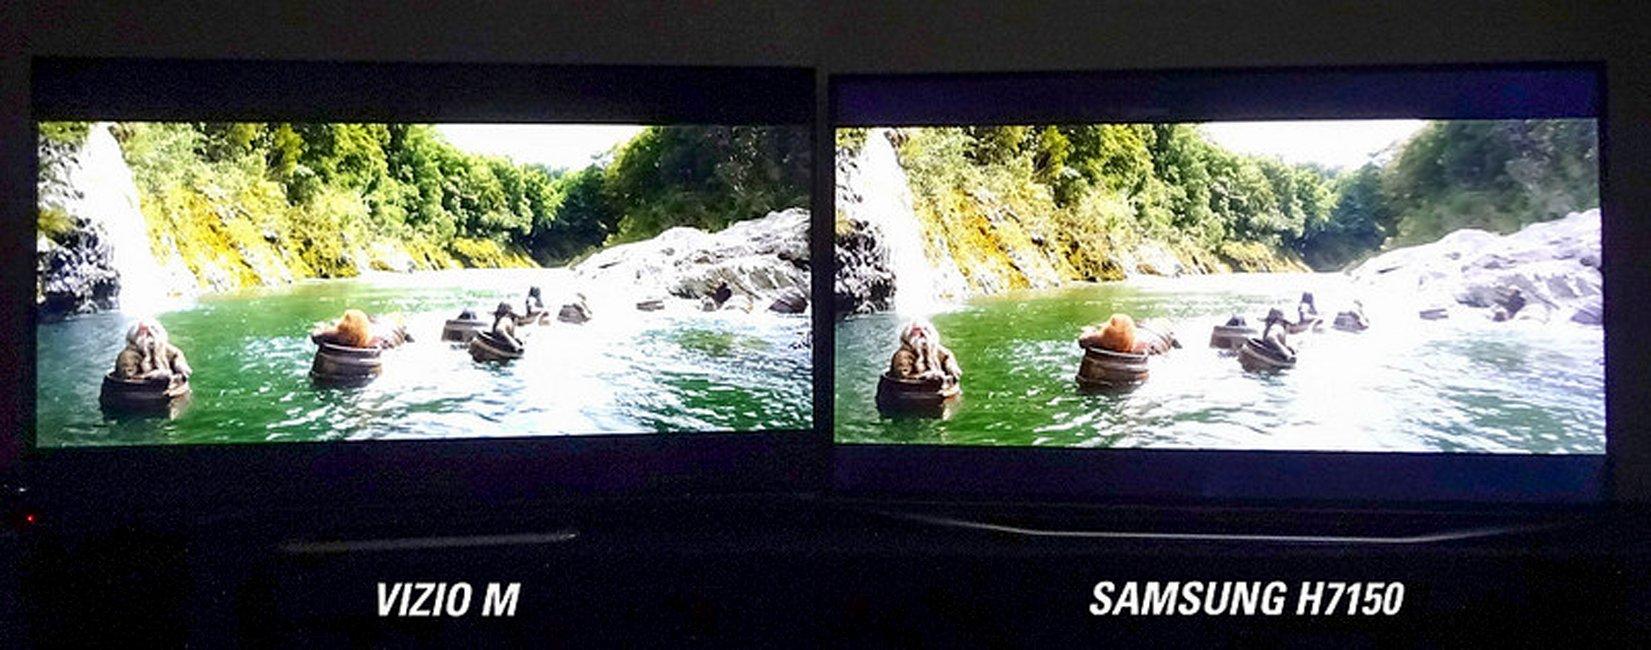 Vizio Demo: M Series vs. Samsung H7150